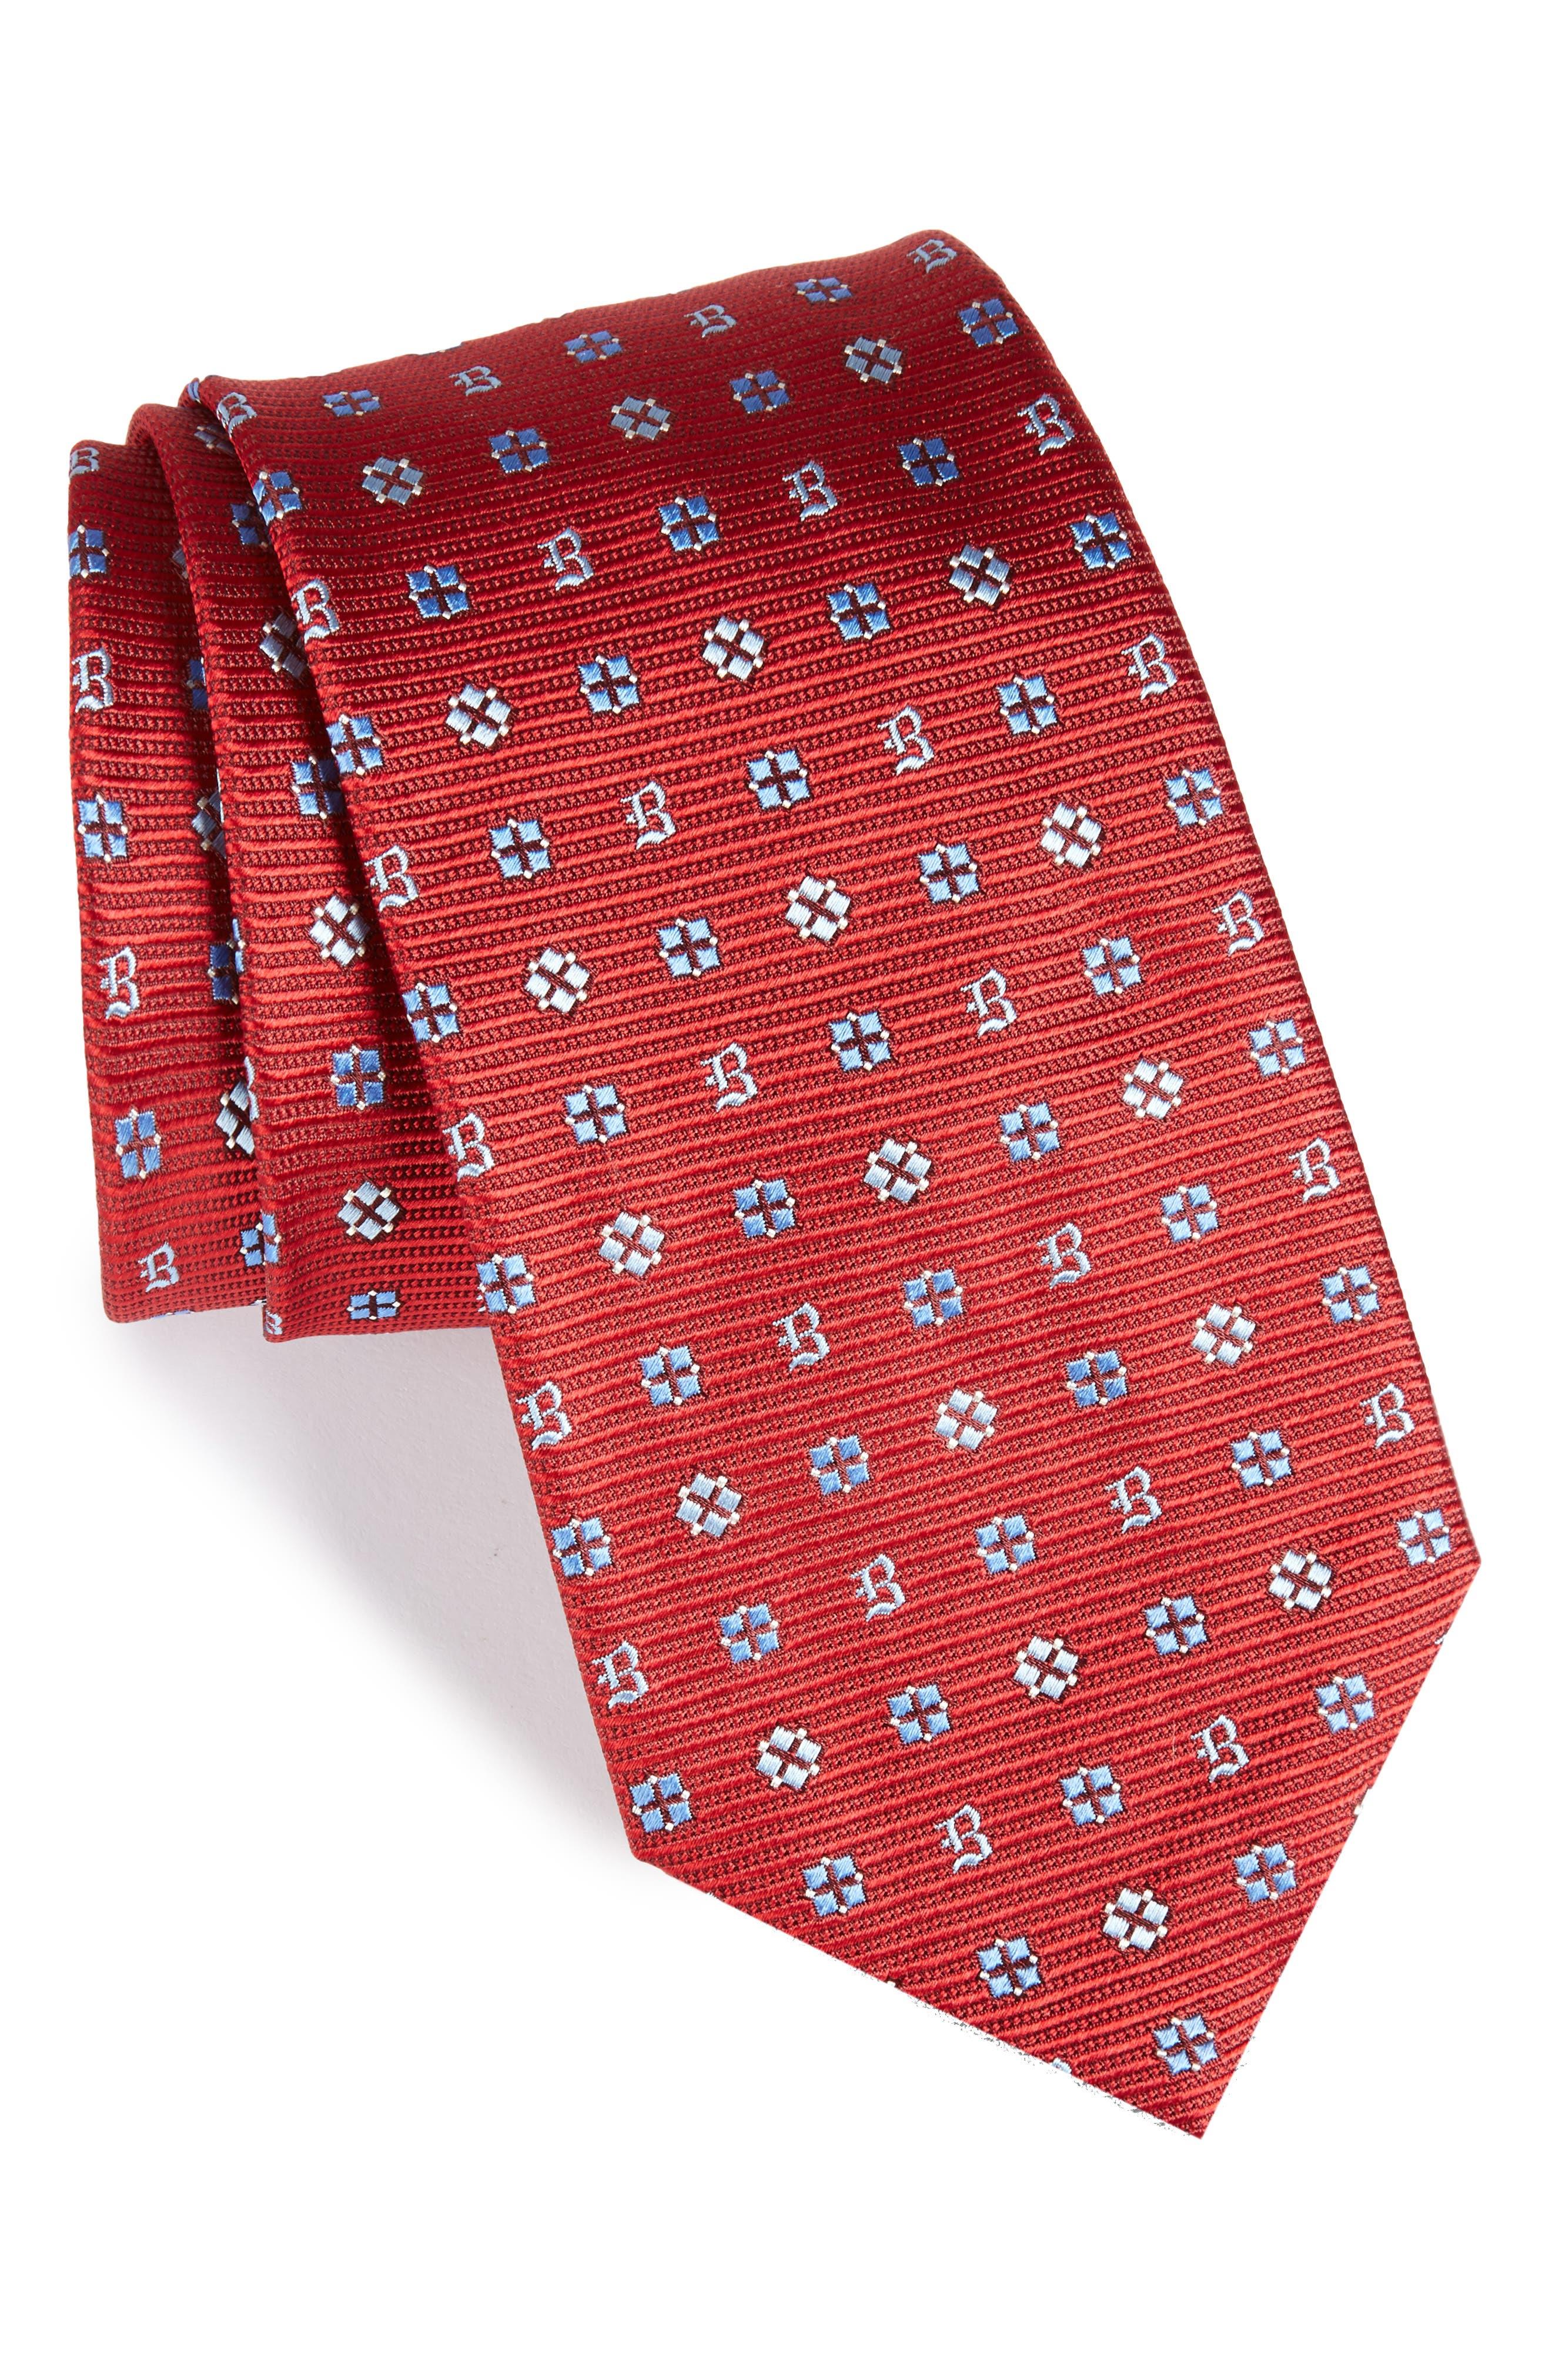 Alternate Image 1 Selected - Brioni Medallion Silk Tie